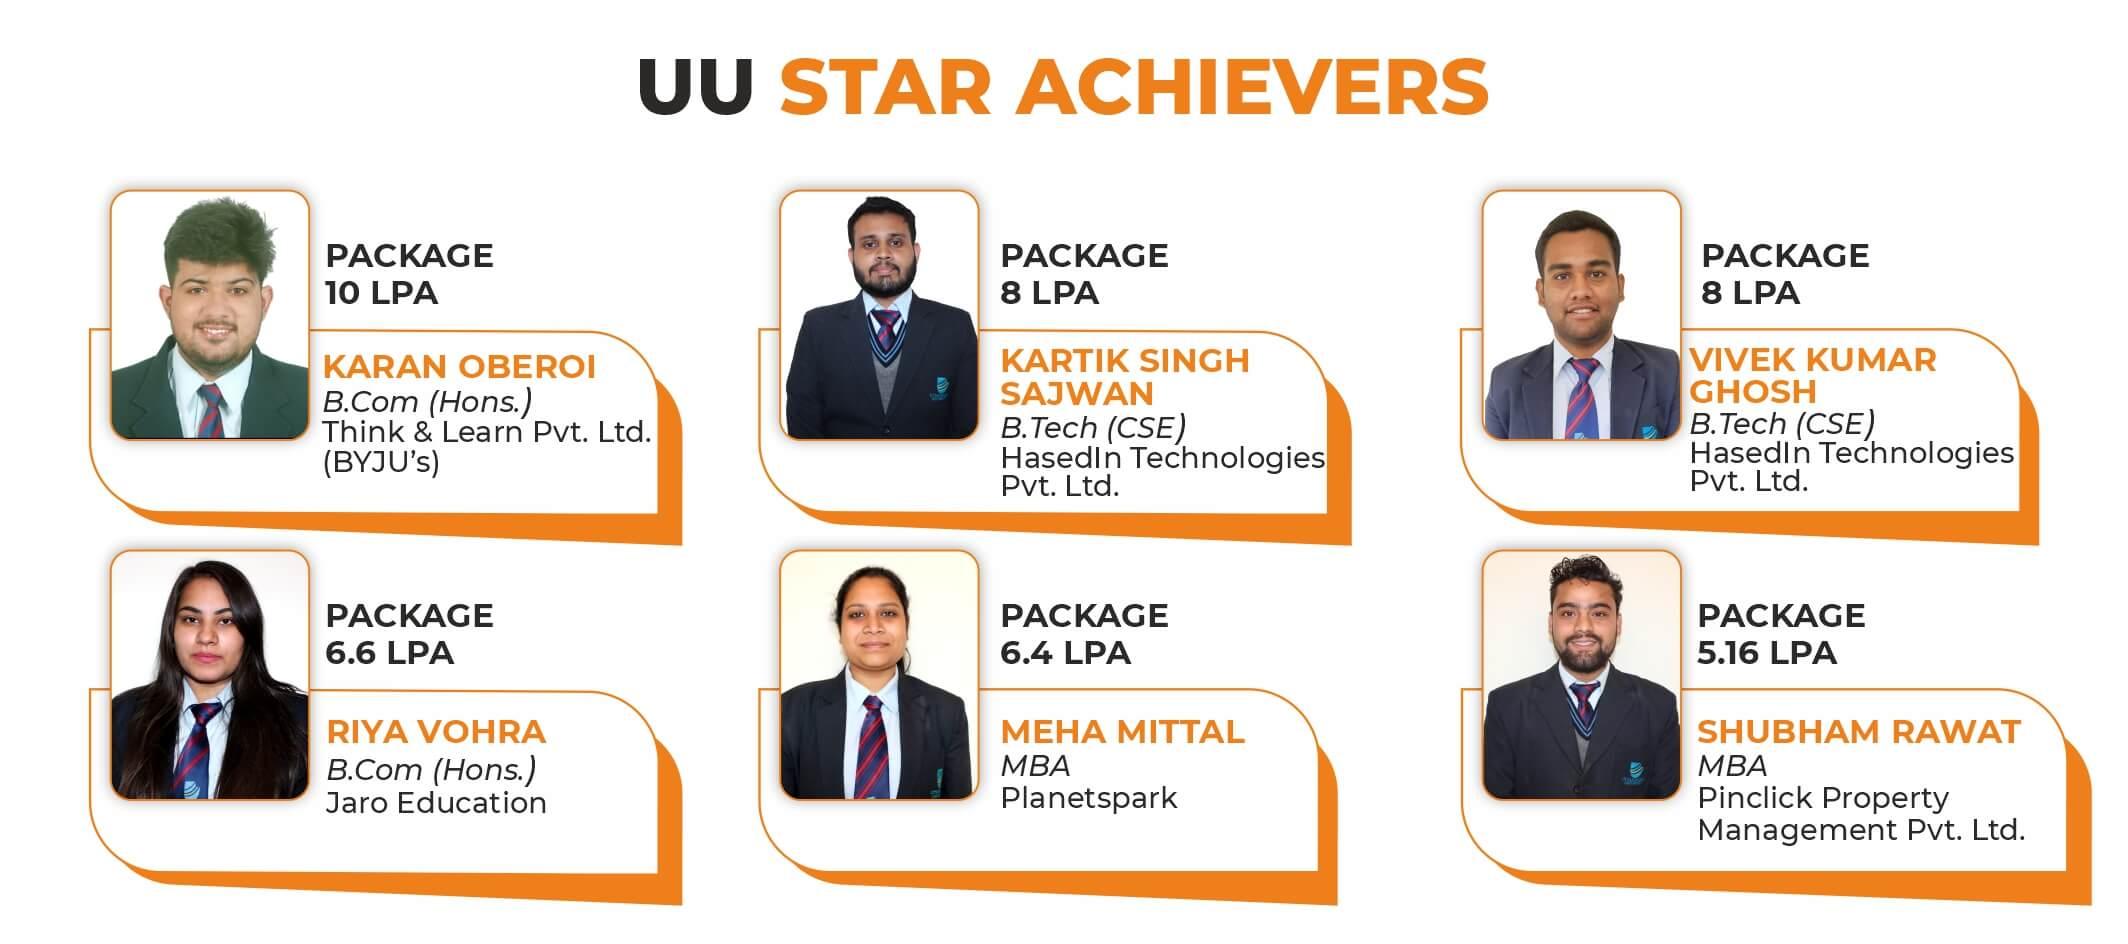 uu-star-achievers-slider